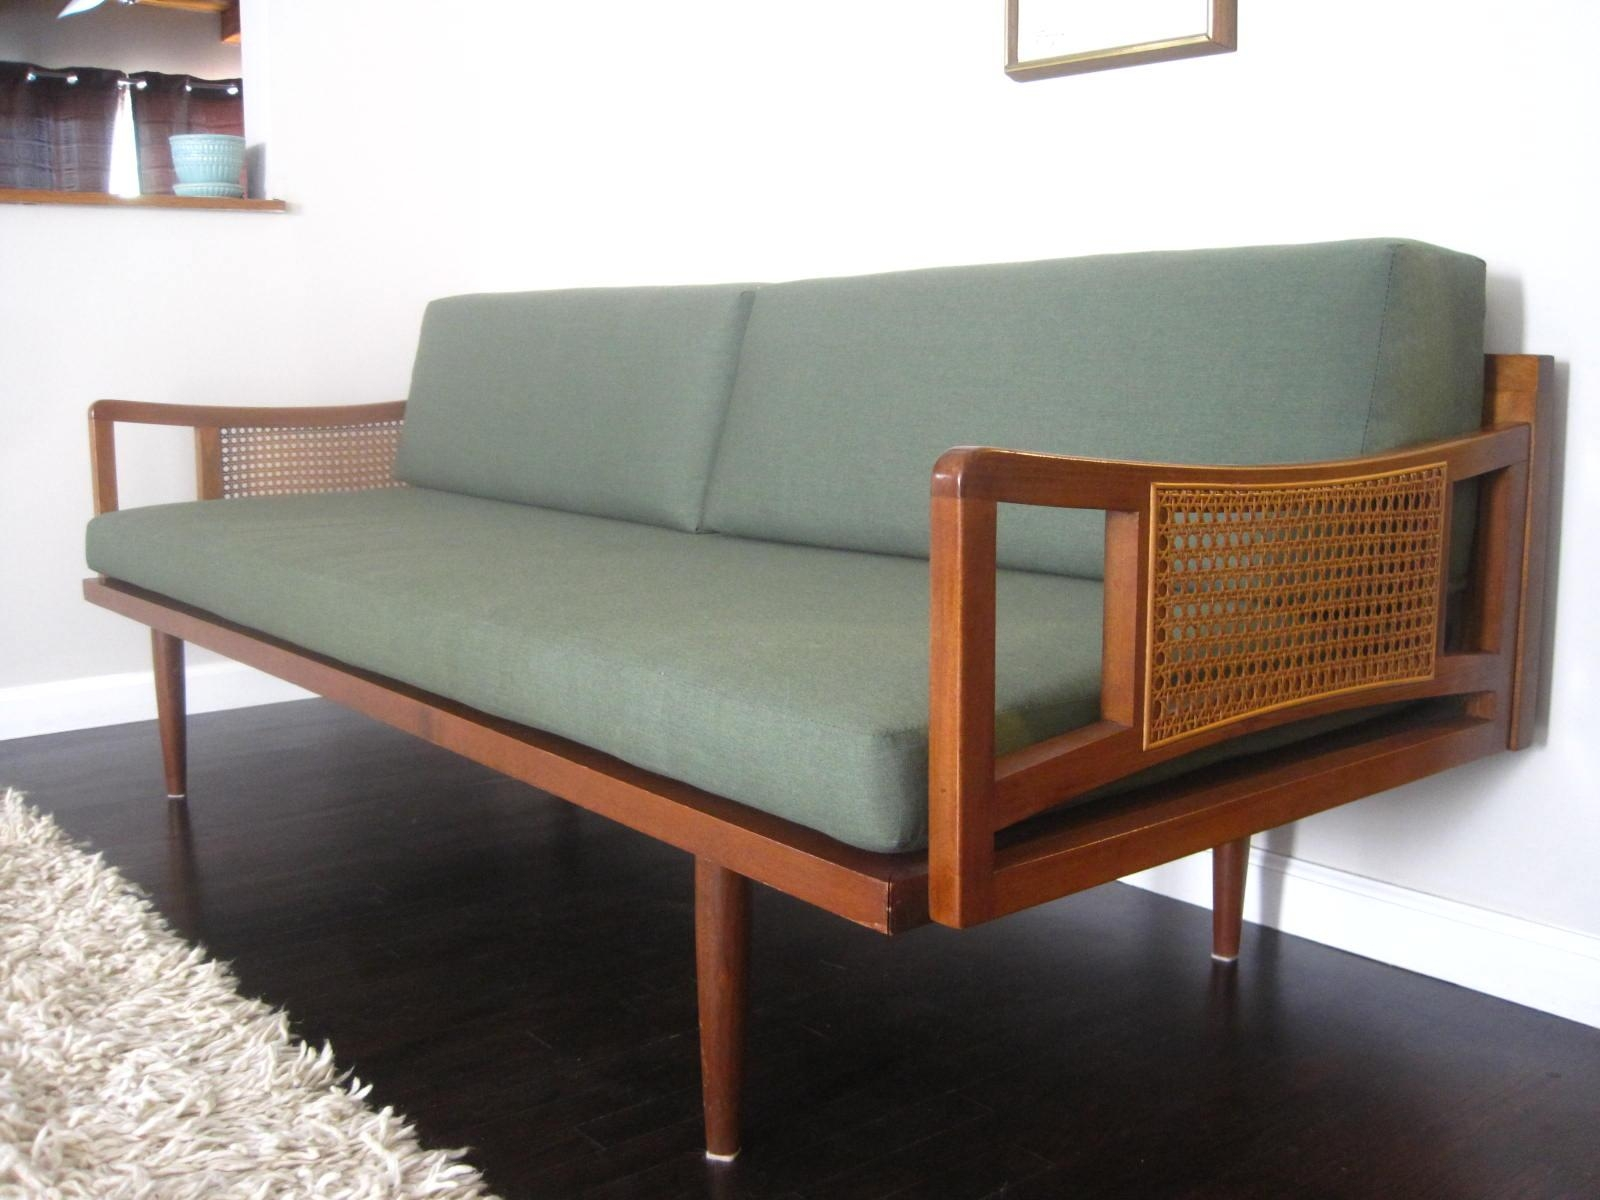 Decor: Lovable Vintage Danish Modern Furniture Bench Mid Century Regarding Danish Modern Sofas (Image 7 of 20)